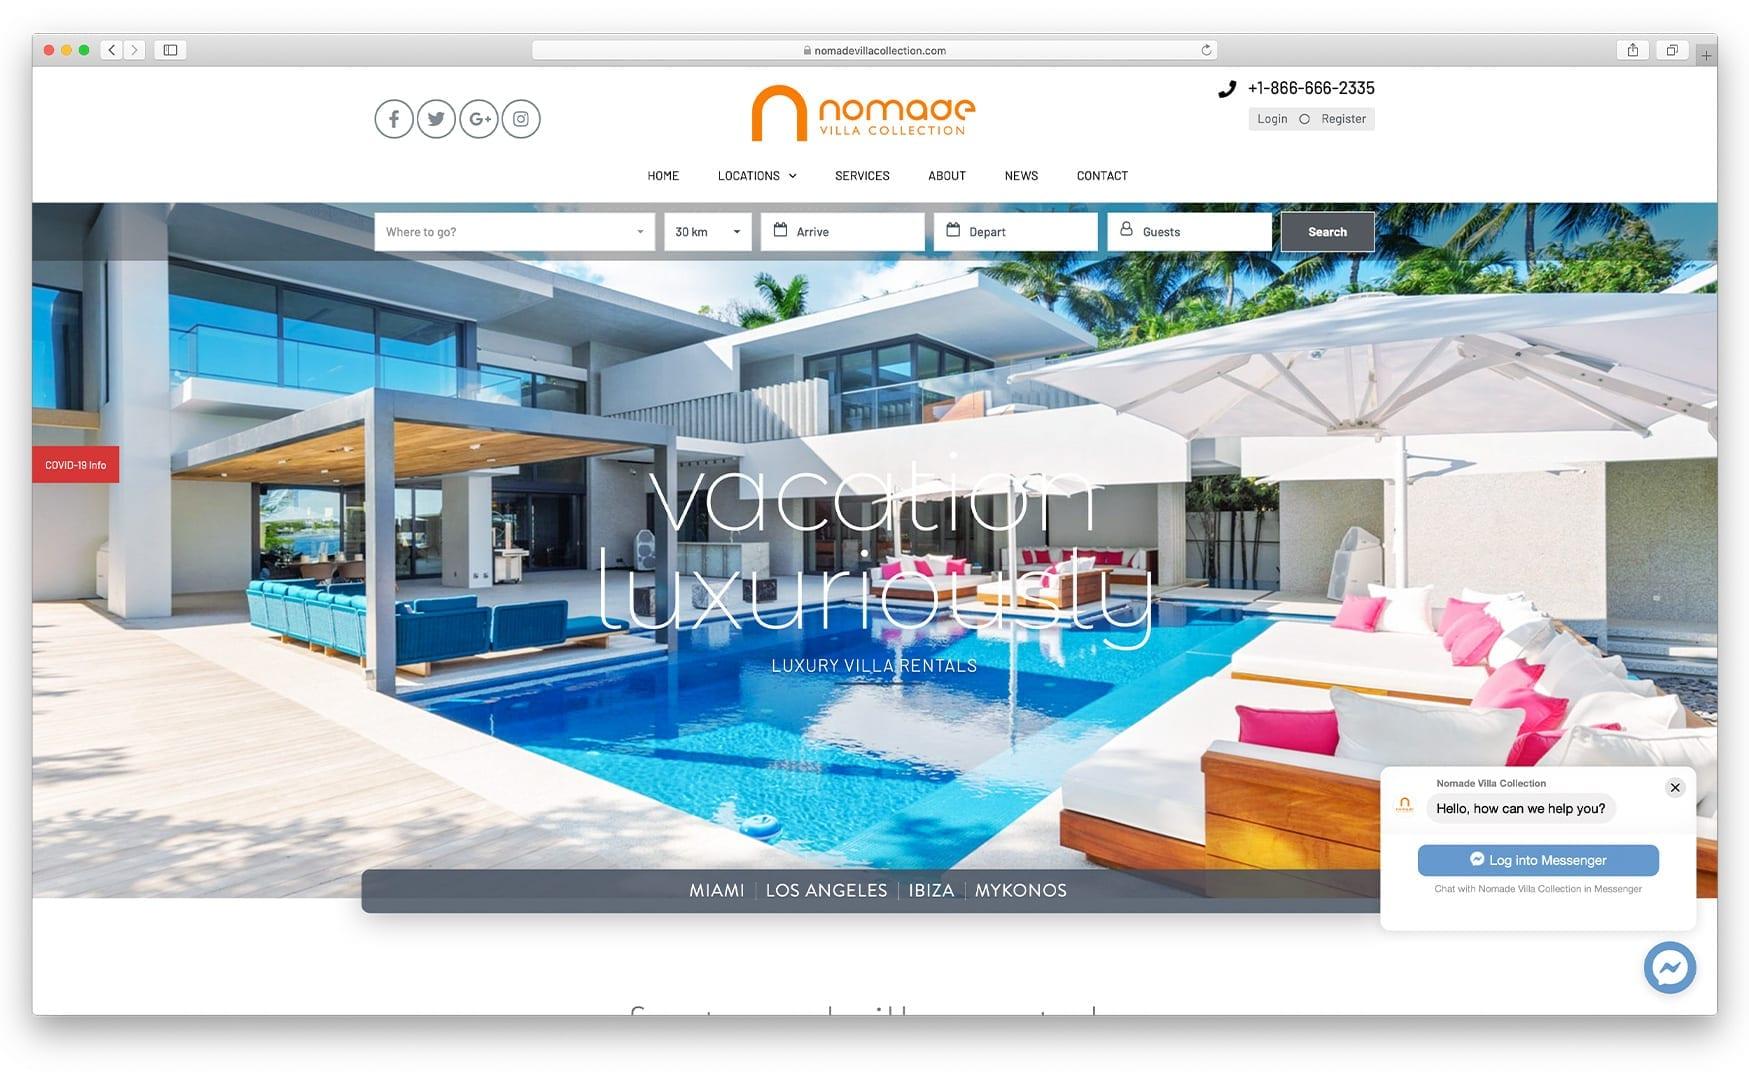 Nomade Villa Collection – nomadevillacollection.com - Website Design by sliStudios | Miami